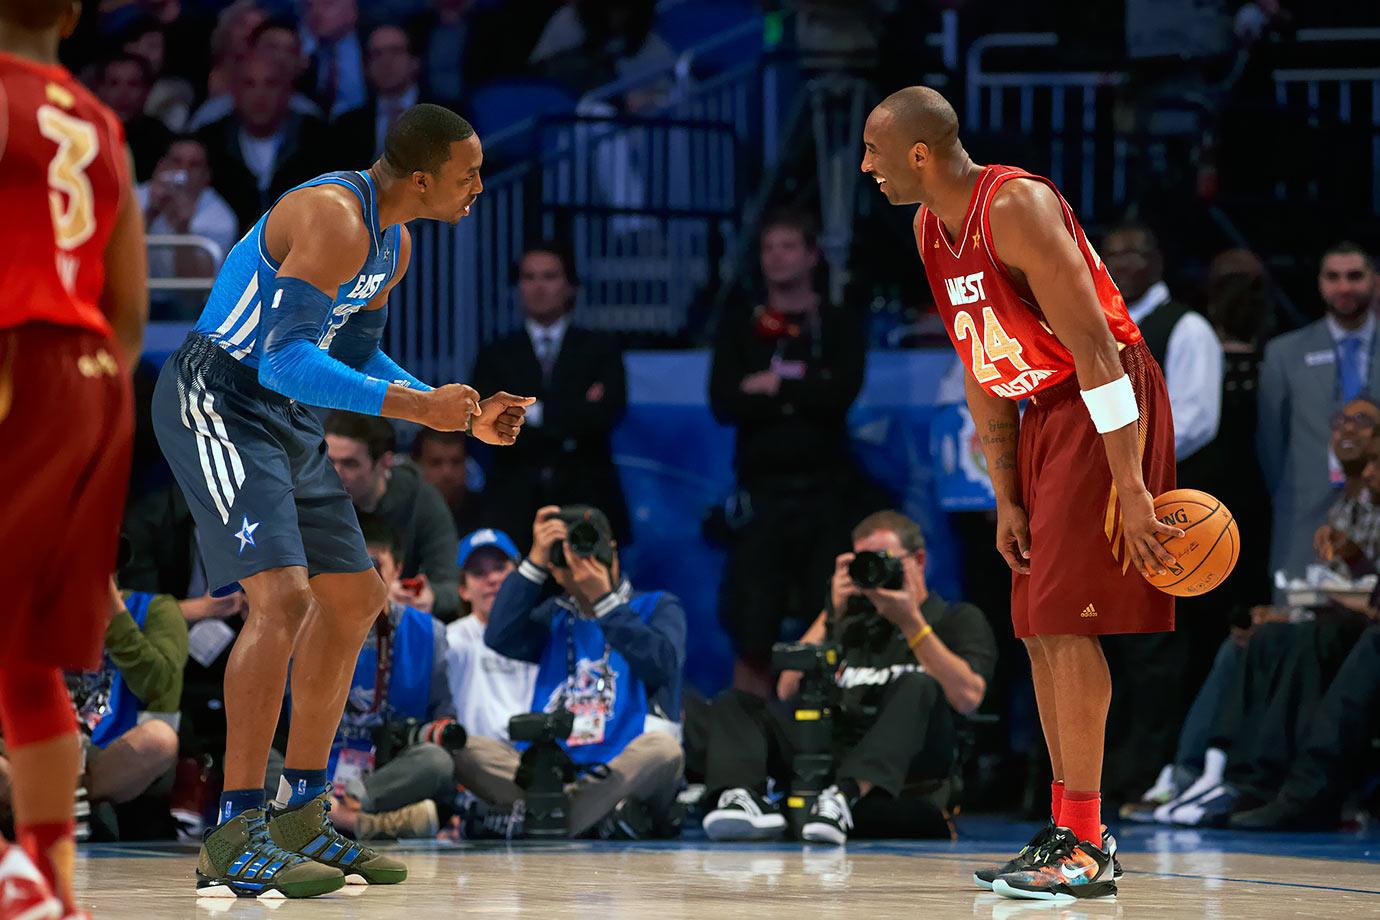 Feb. 26, 2012 — NBA All-Star Game